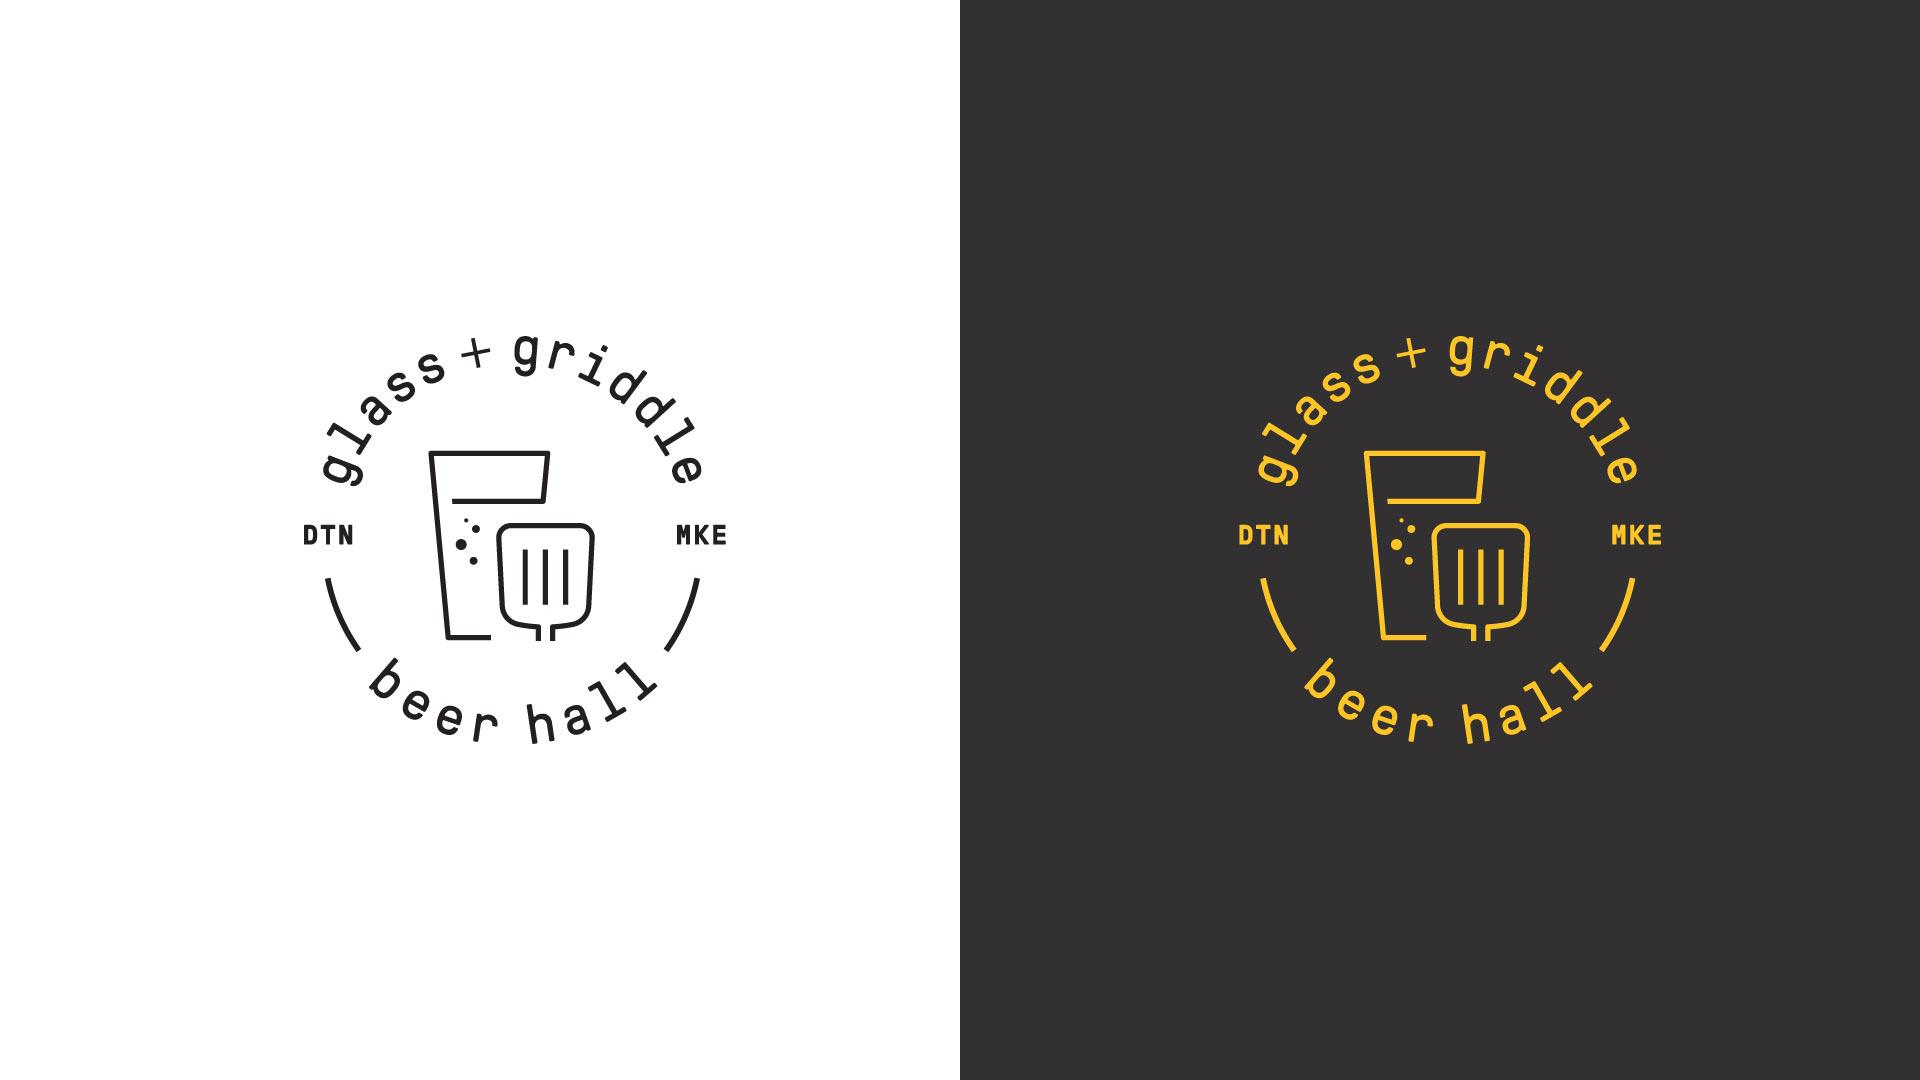 glass-griddle-alternate-logos